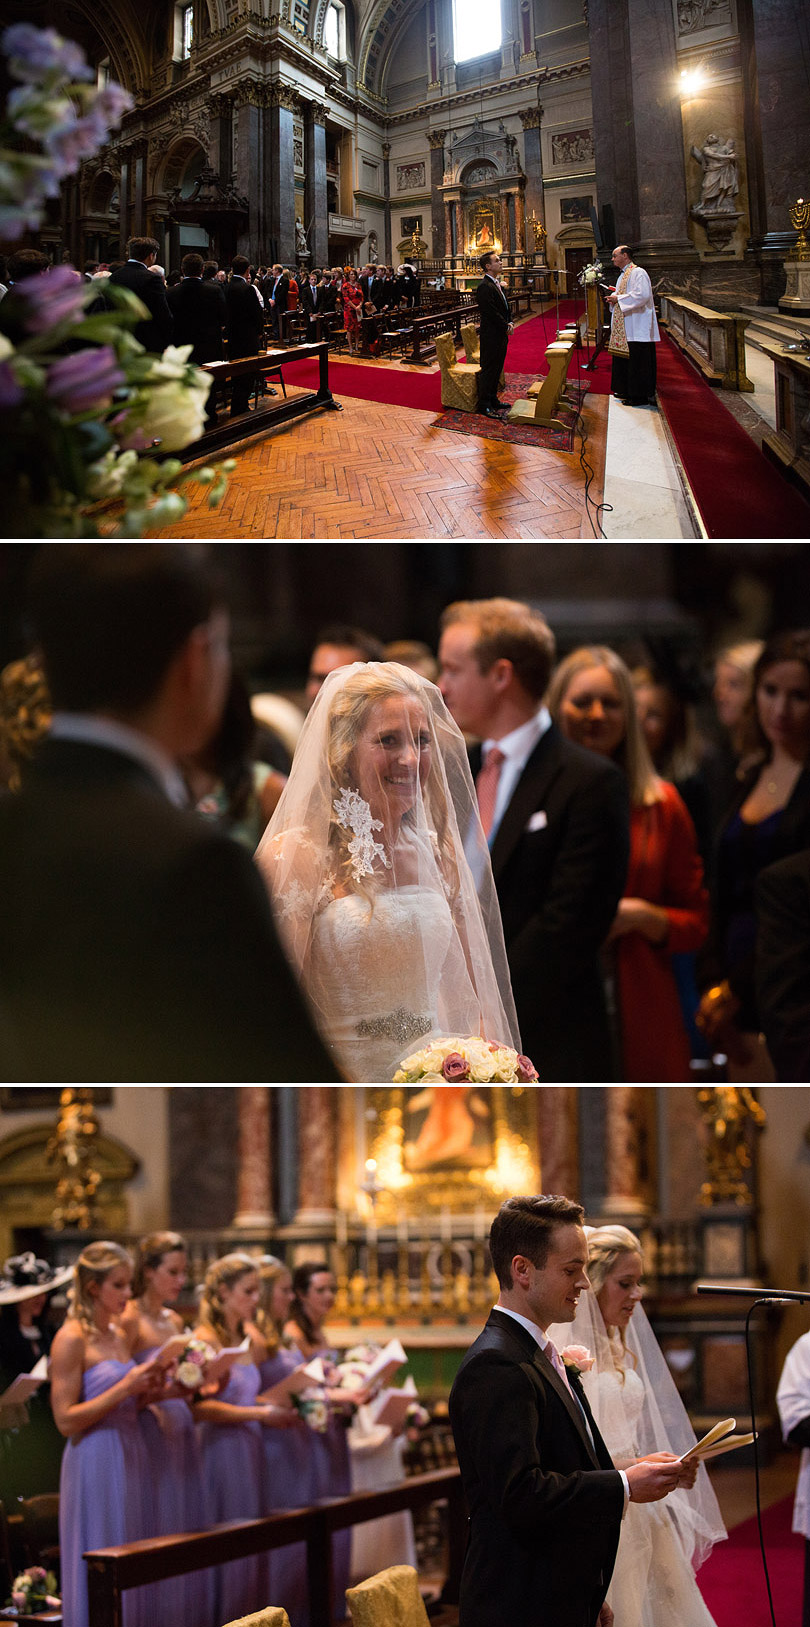 Brompton-Oratory-Lincolns-Inn-Wedding-RachelMax-009.jpg